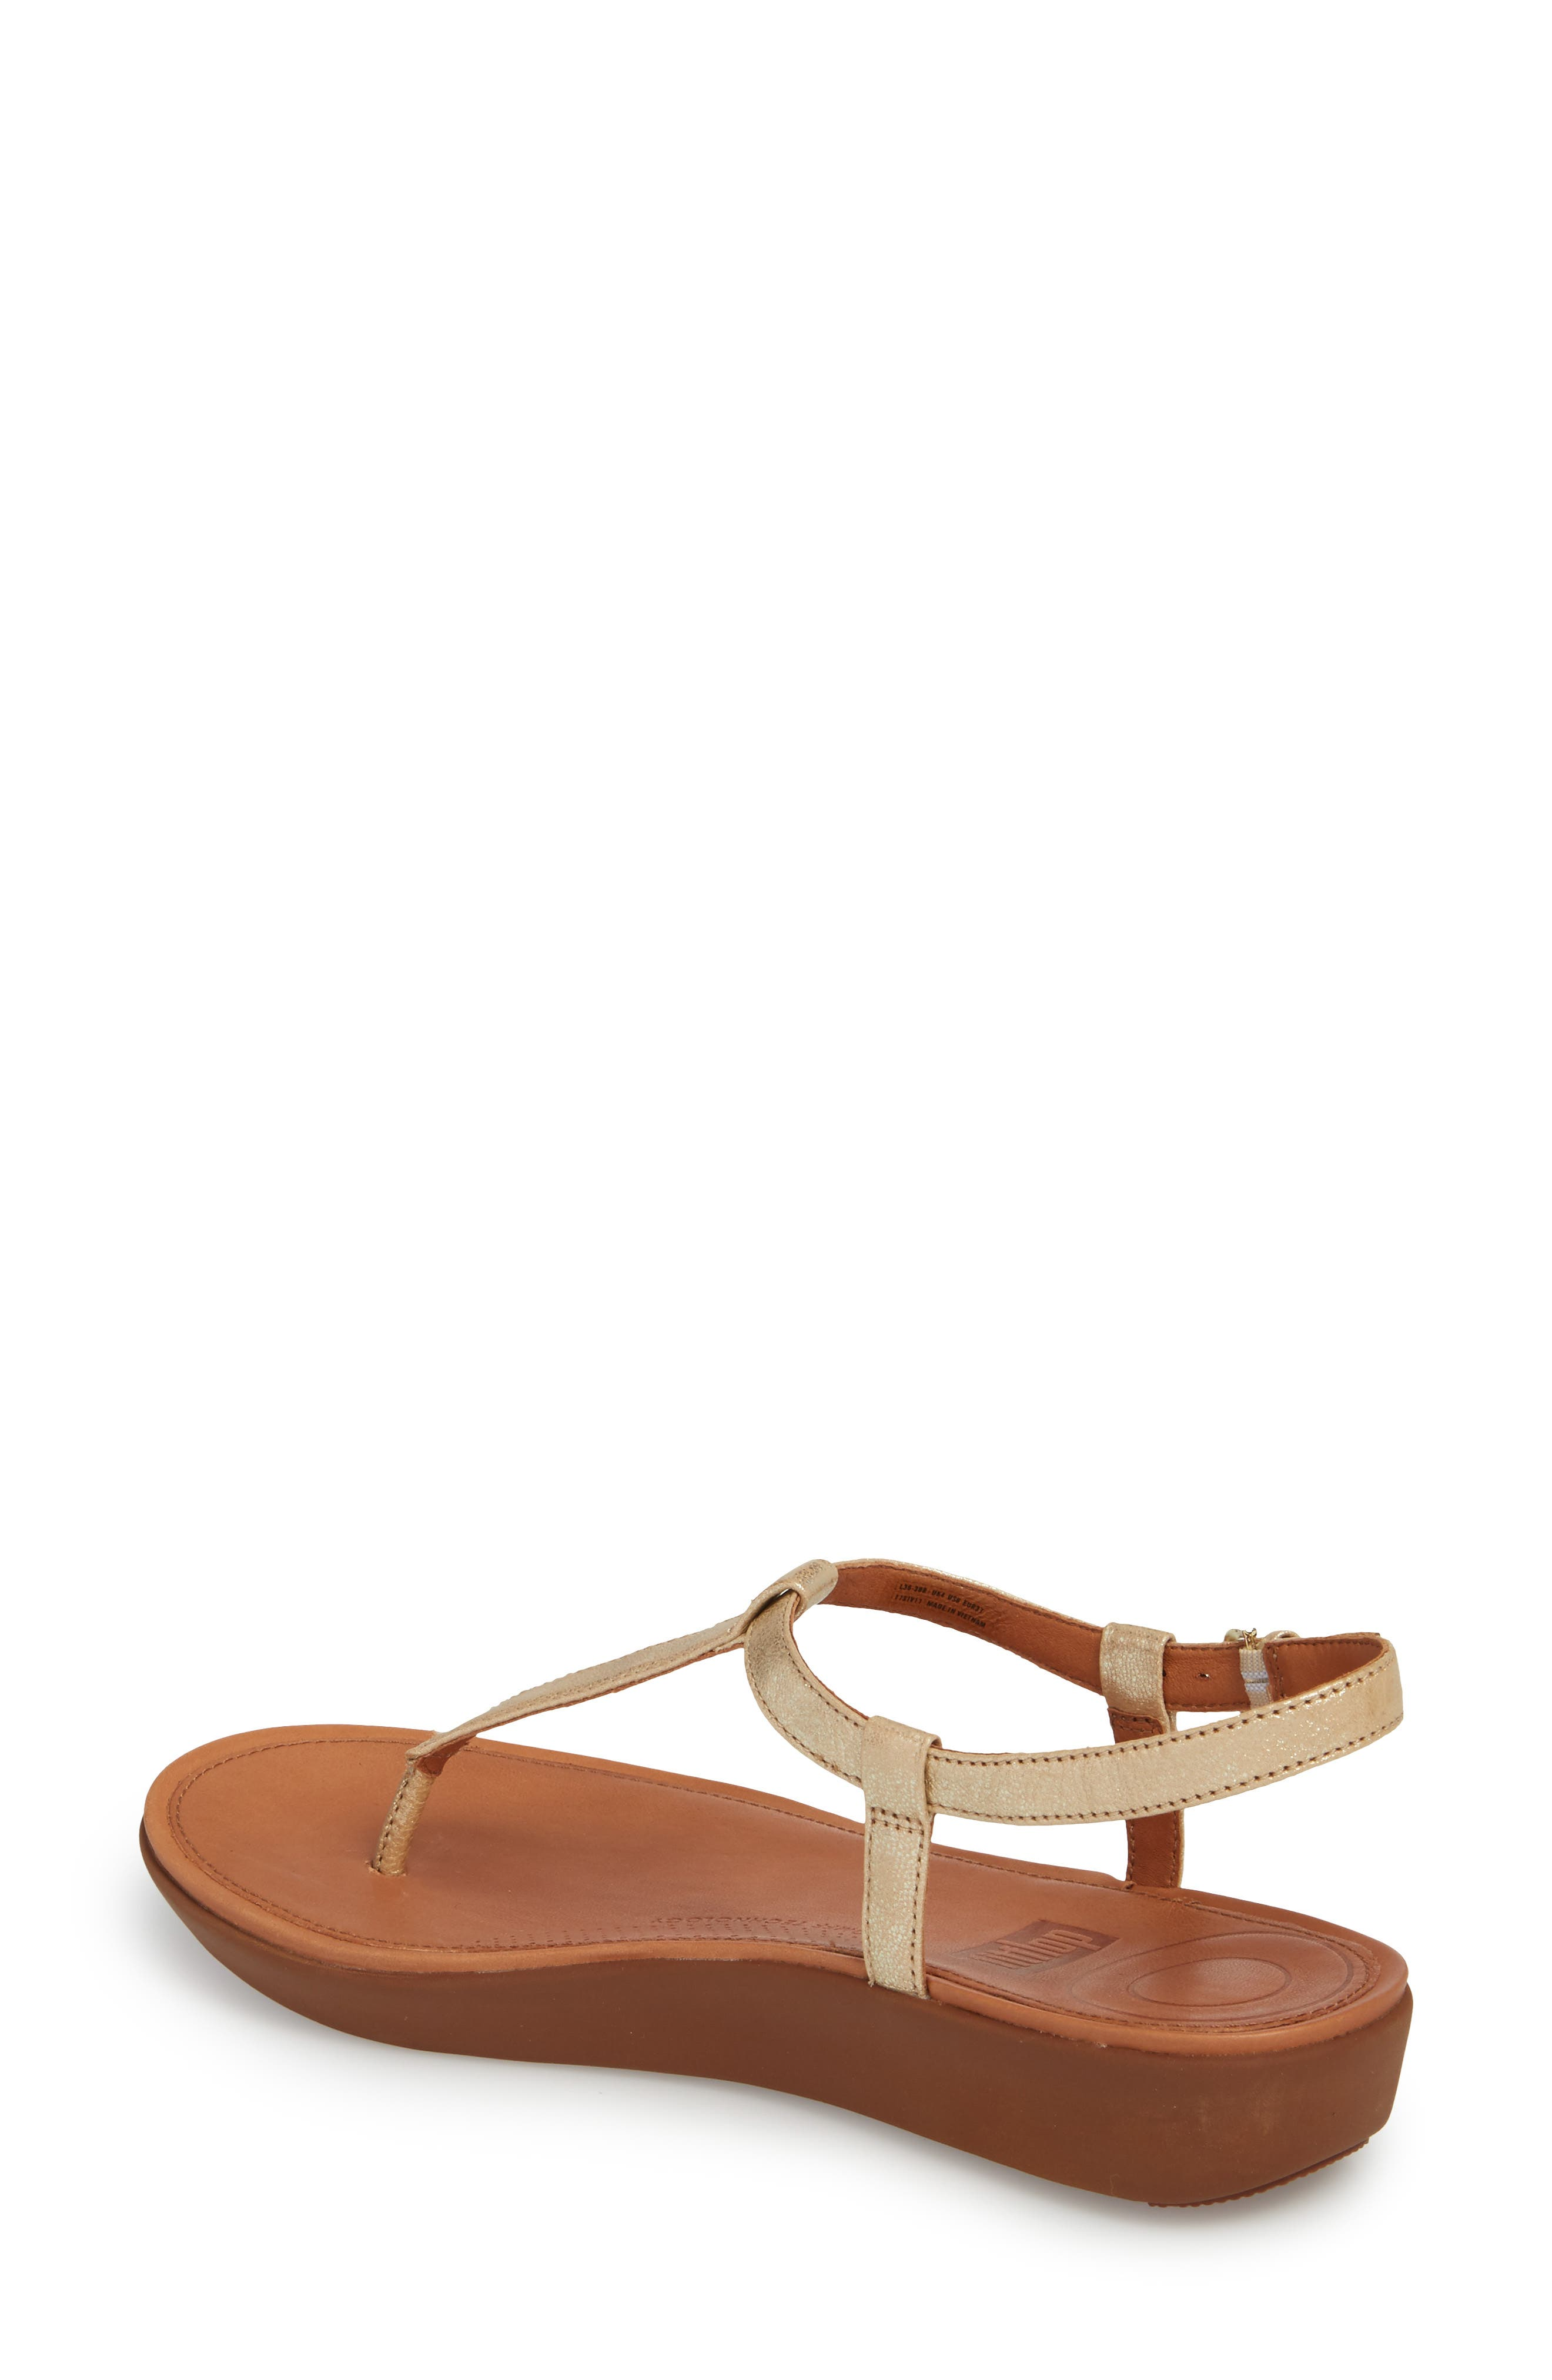 Tia Thong Sandal,                             Alternate thumbnail 2, color,                             Pale Gold Leather